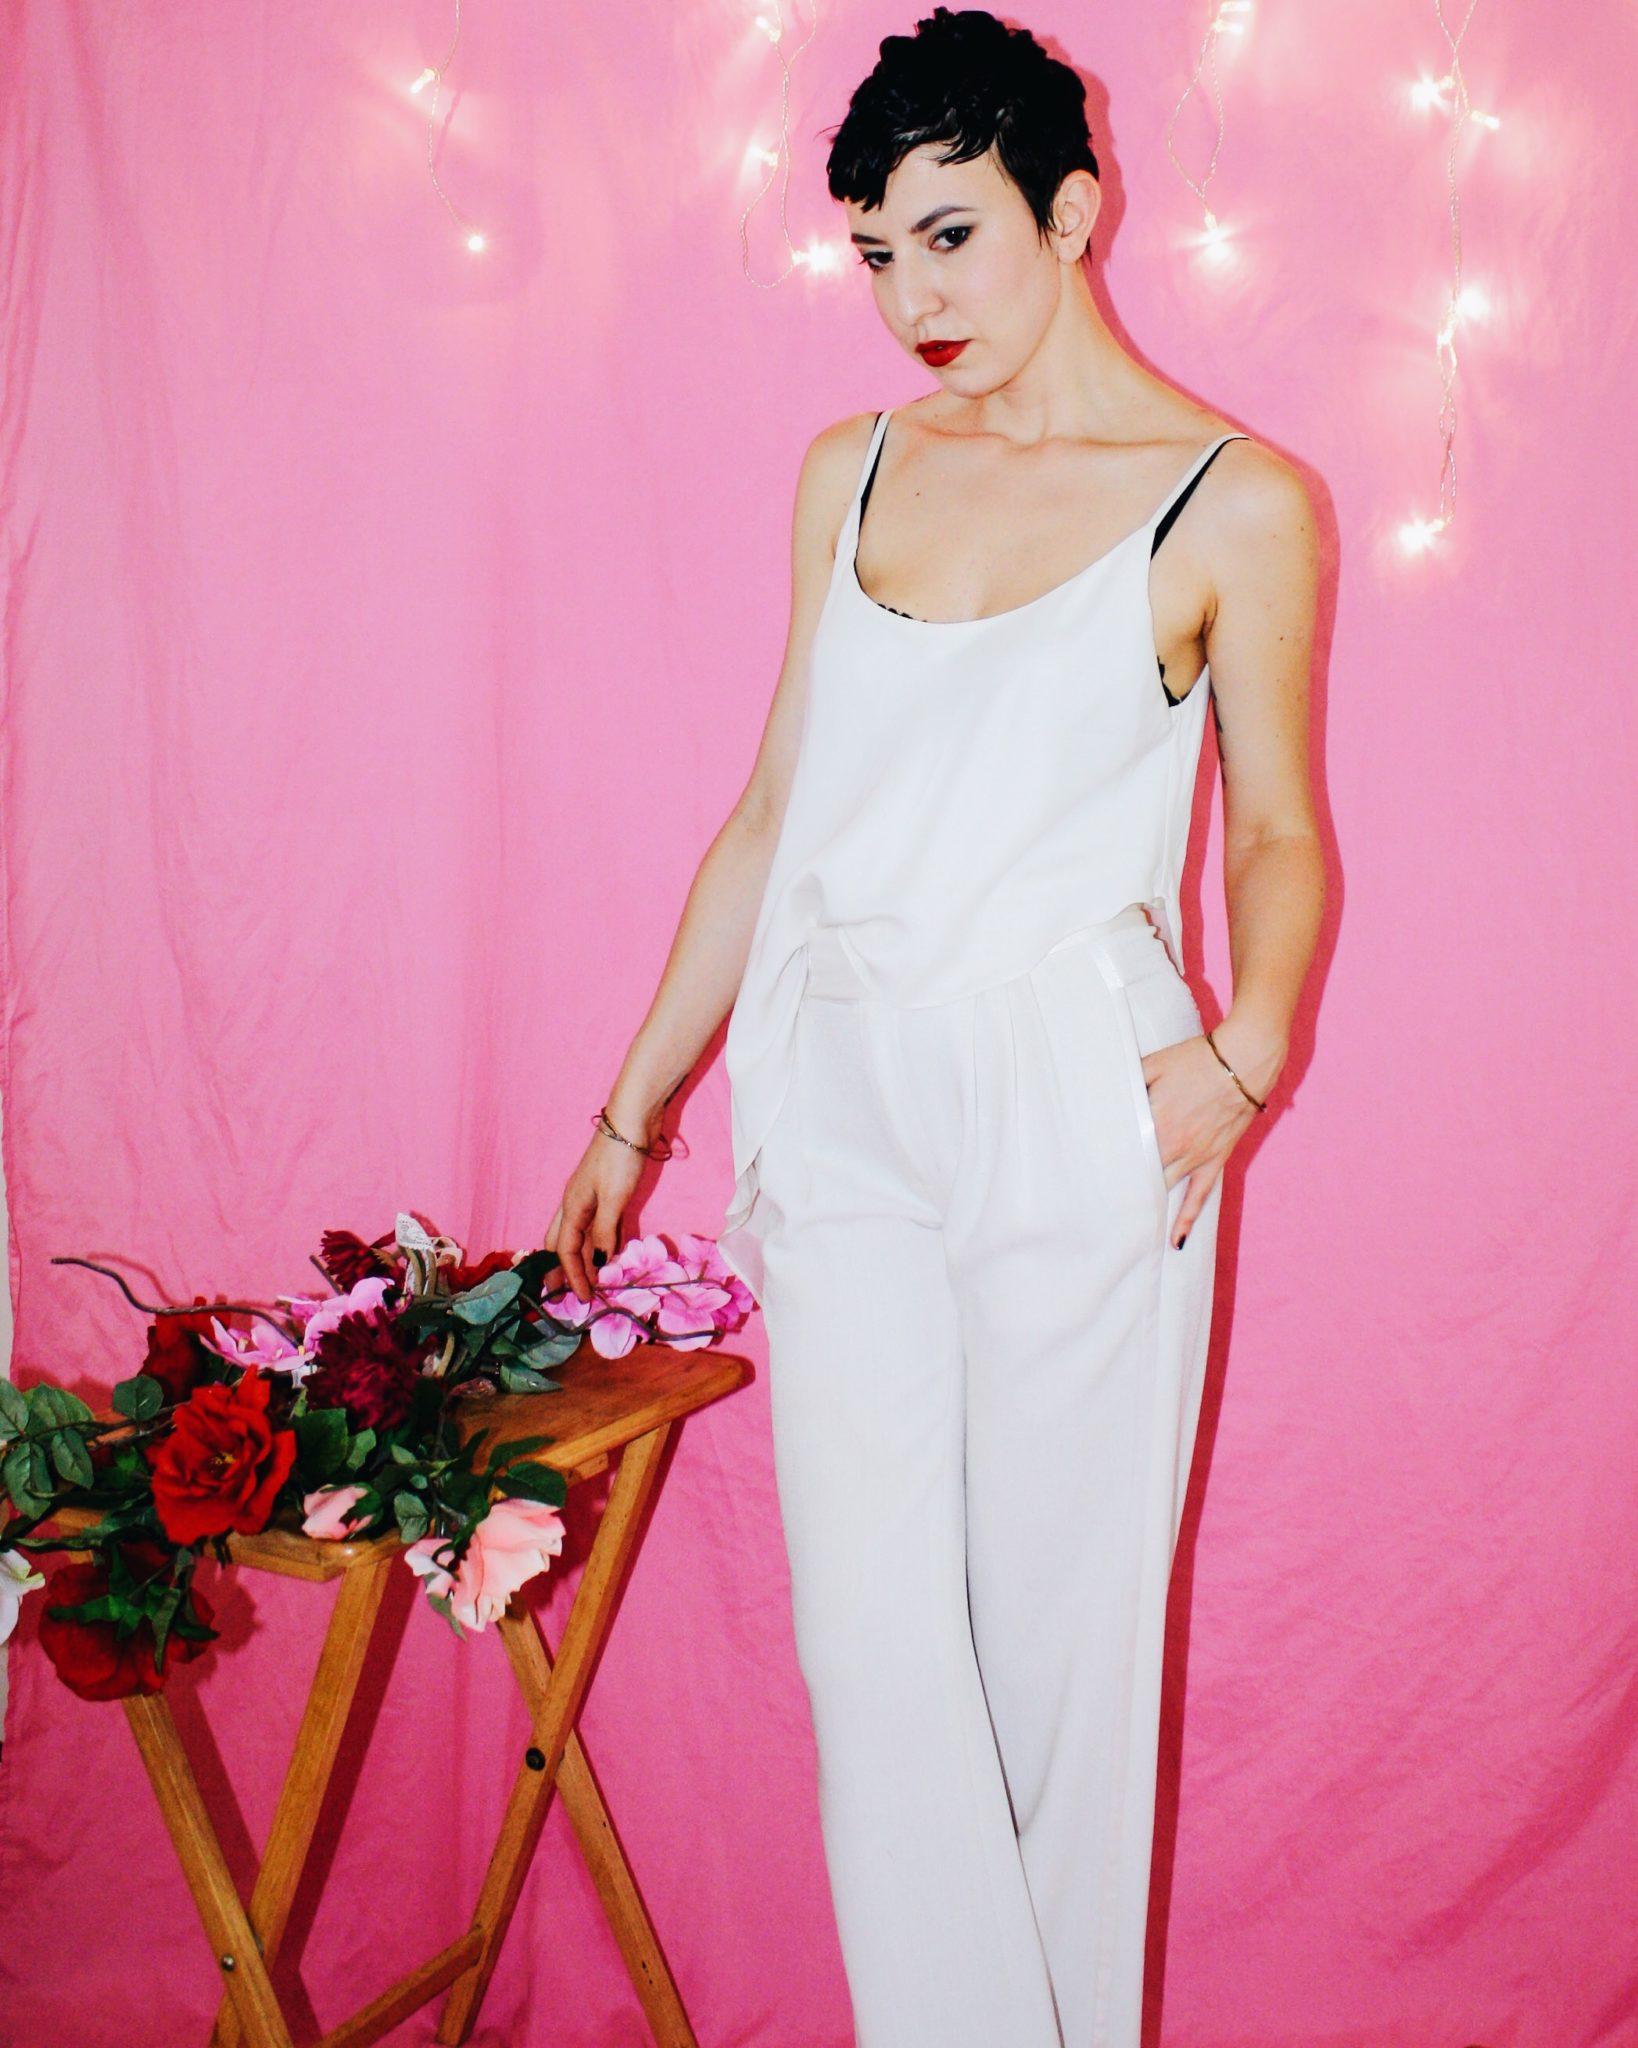 proenza schouler designer imitation white ruffle top spring summer 2018 2017 flowers pink 5